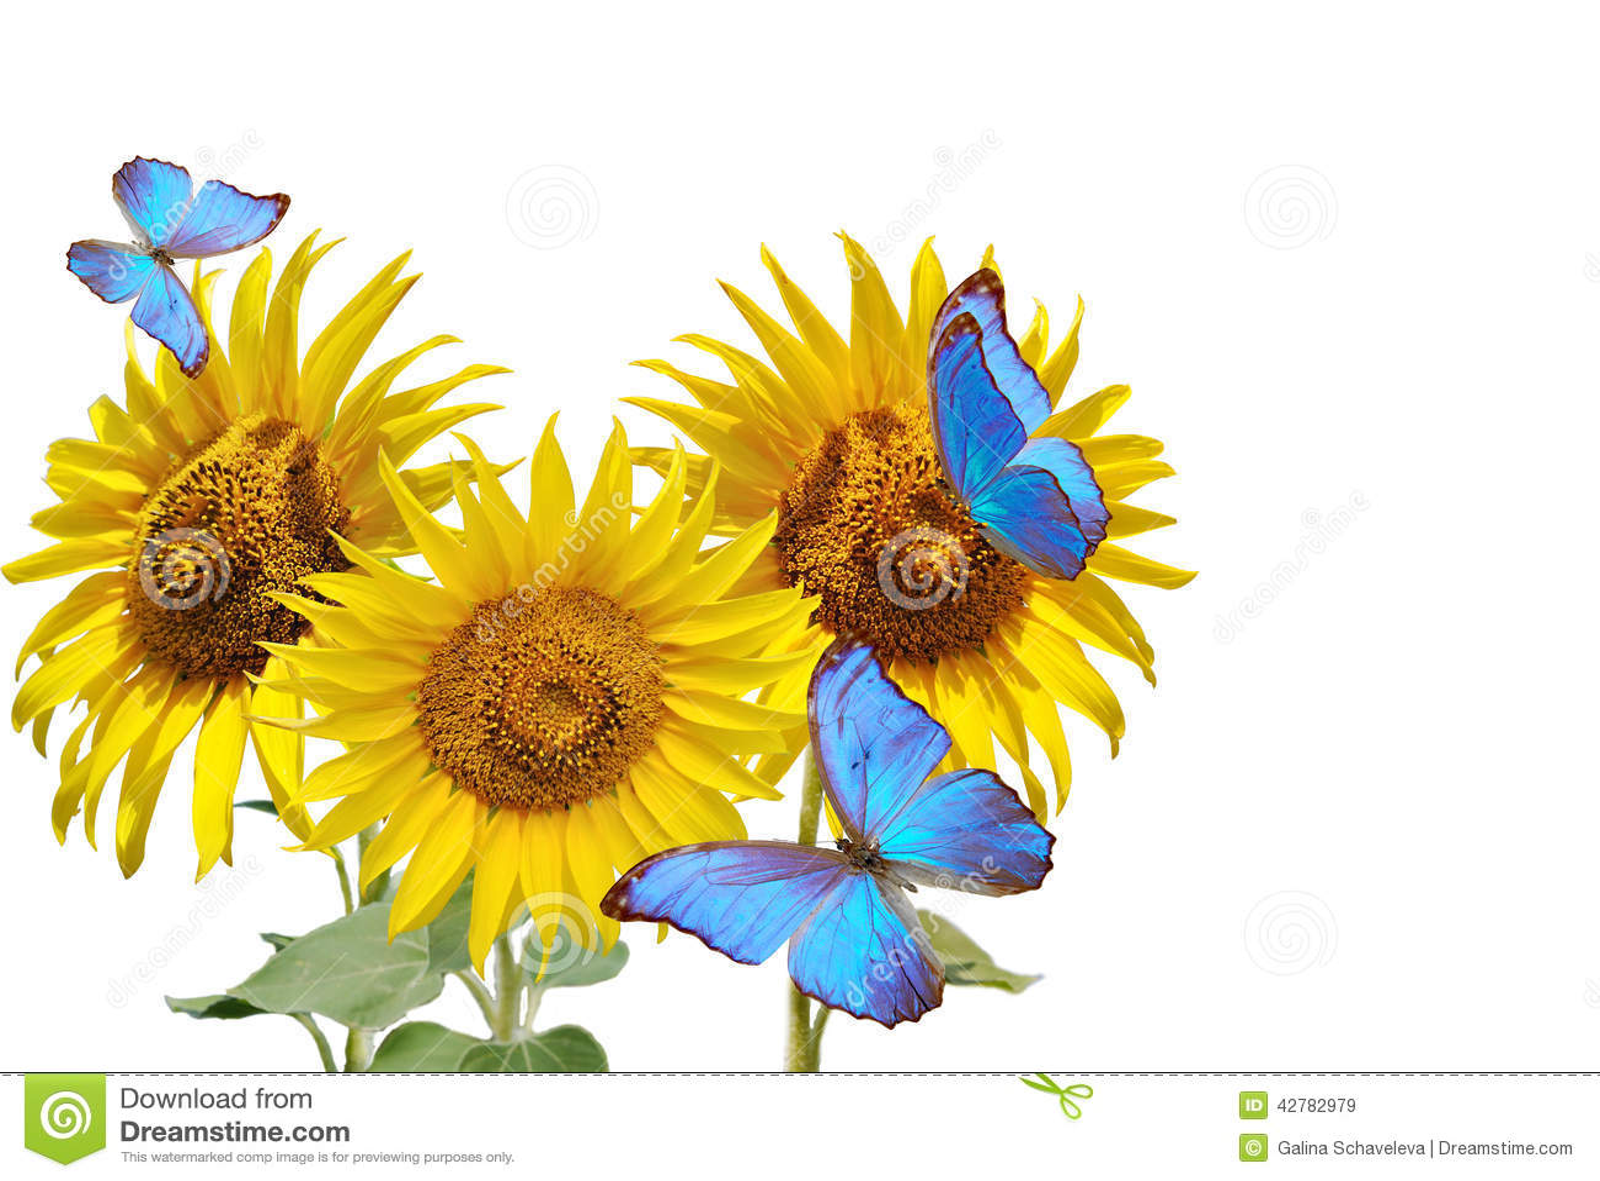 Blue Butterfly On Sunflower | www.pixshark.com - Images ...